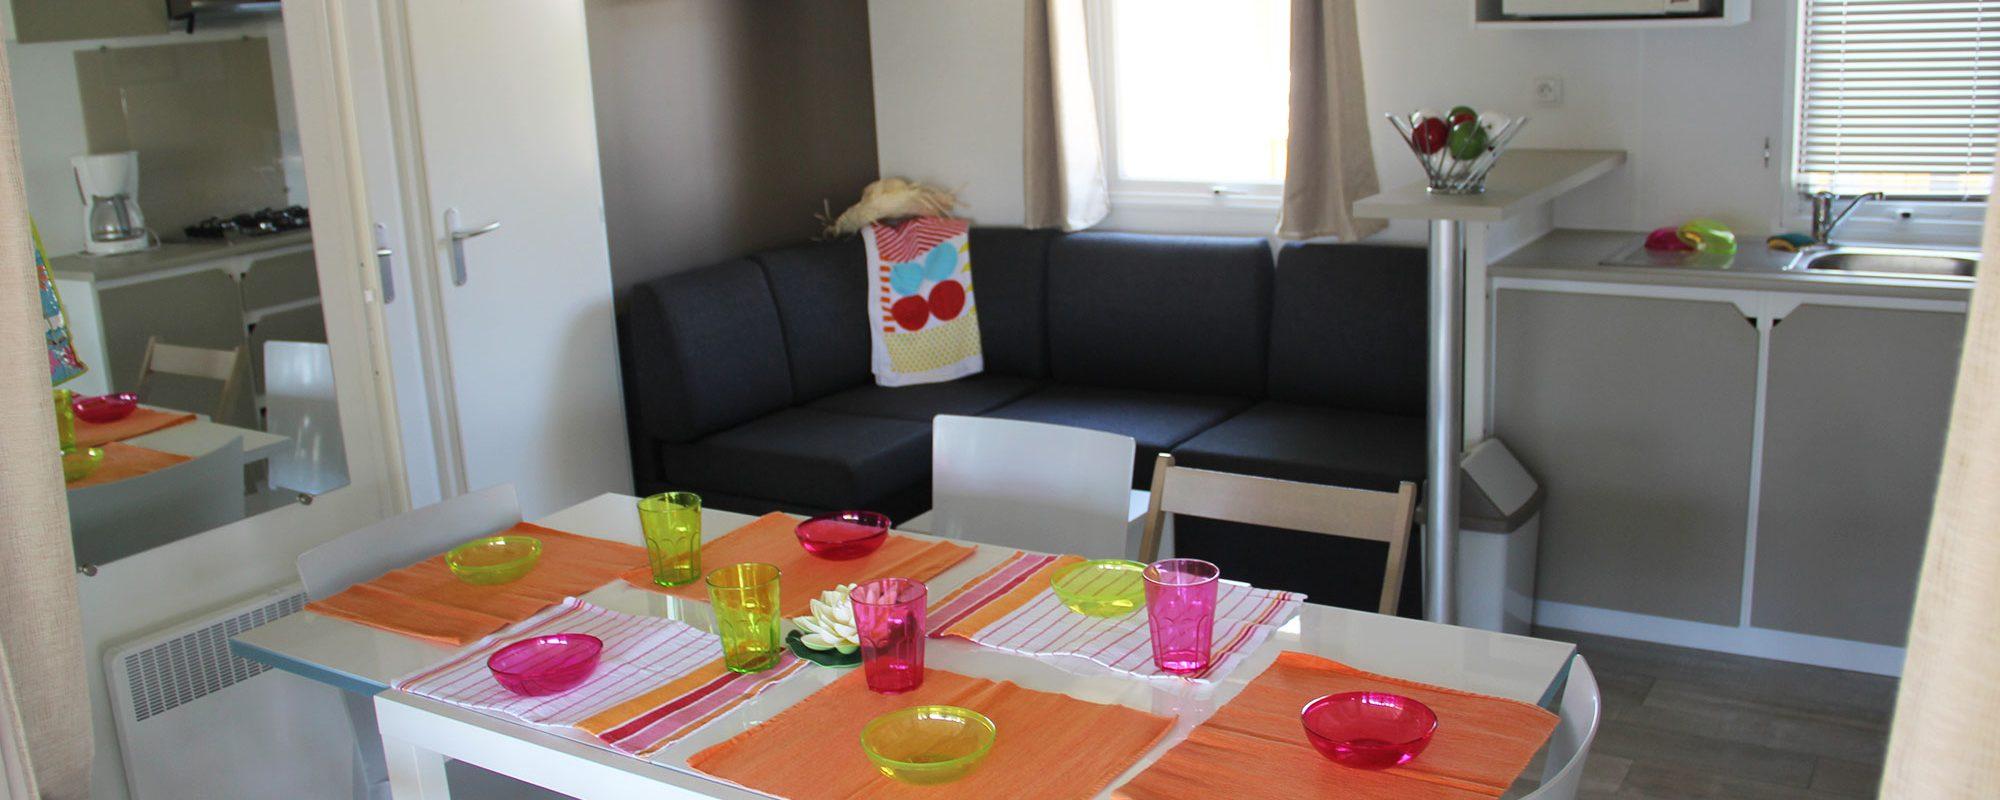 cuisine du mobilhome cordelia en vente camping à proximité de Guérande